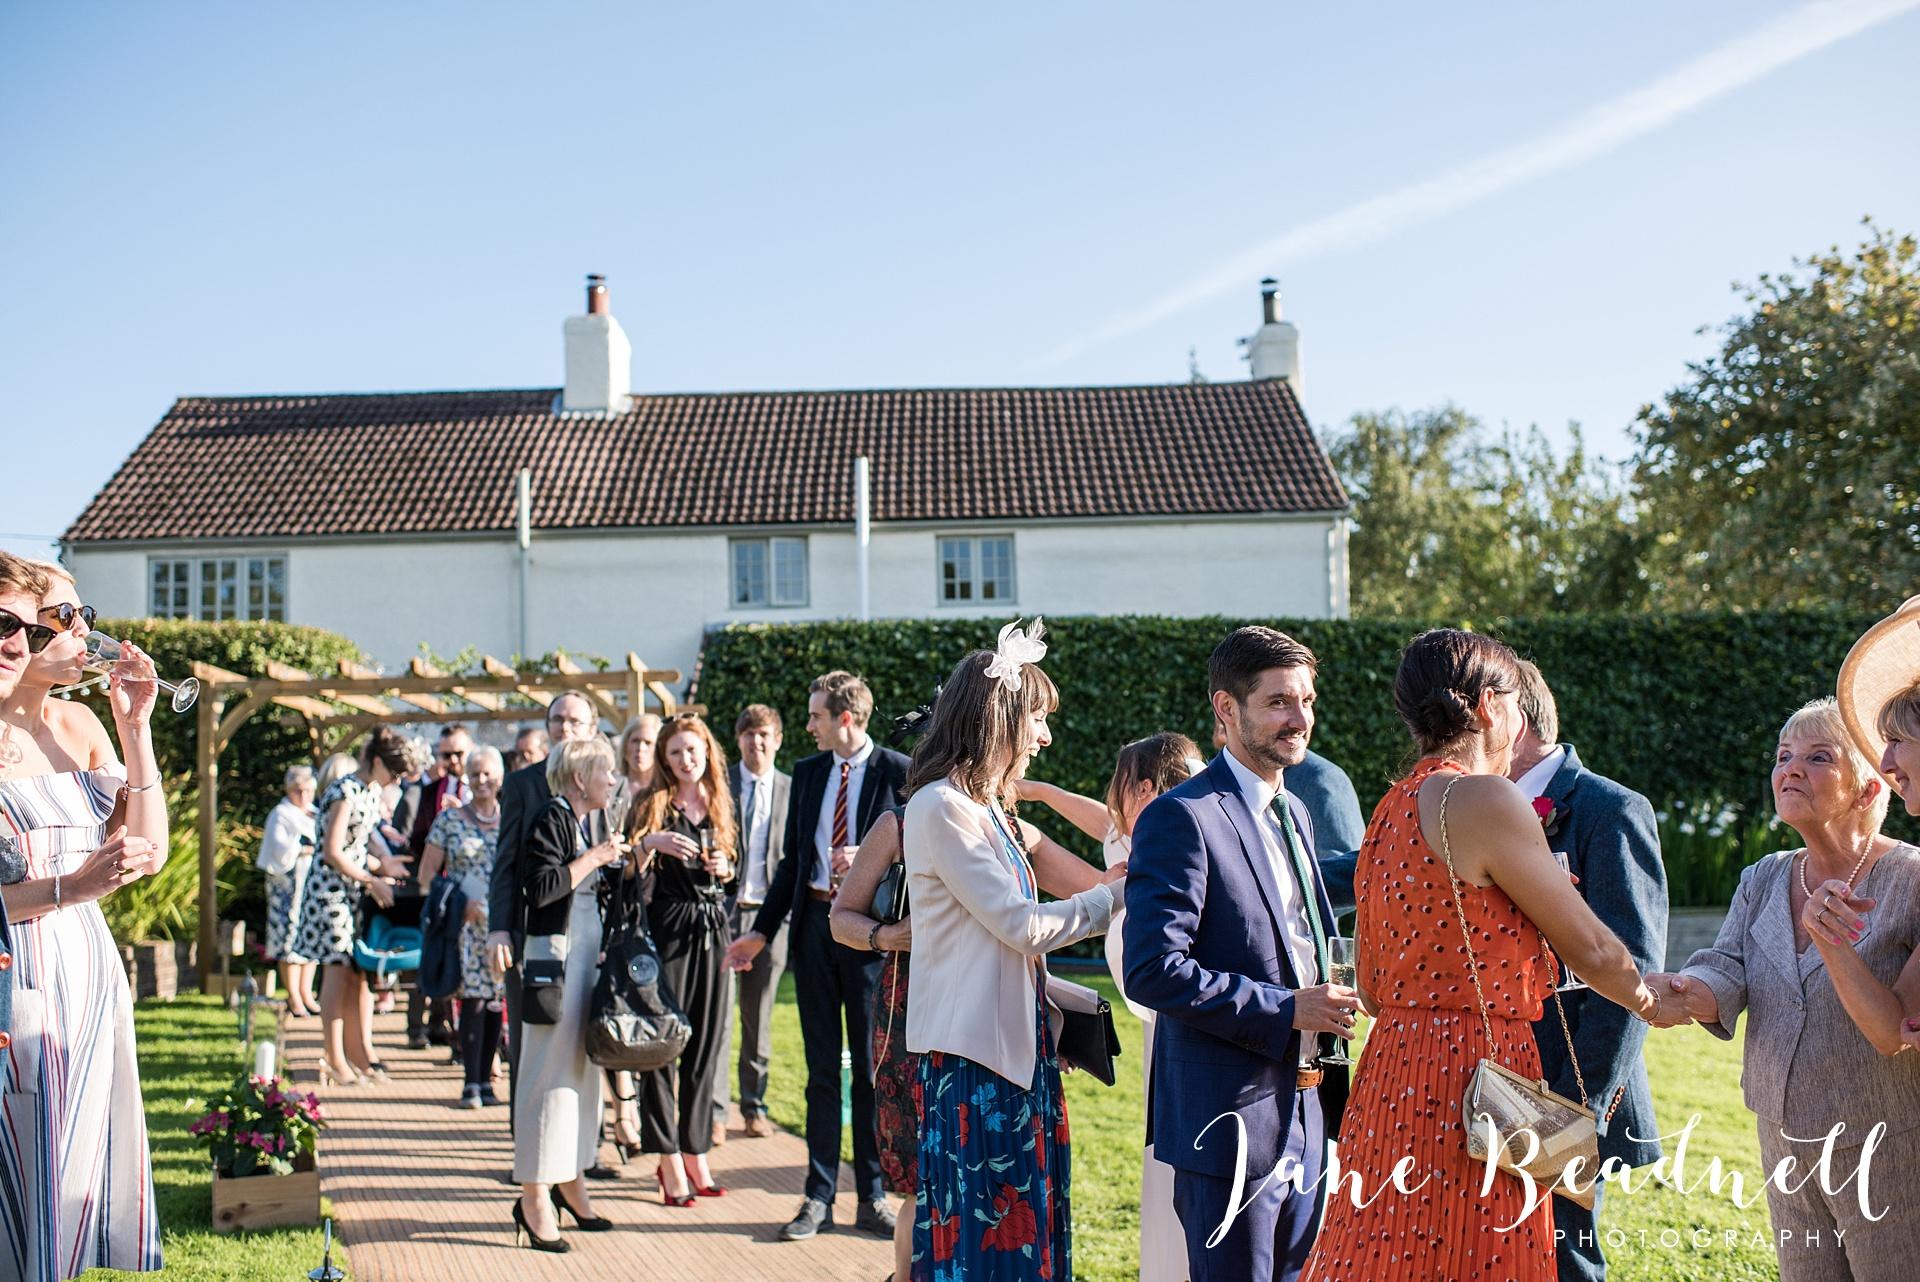 fine-art-wedding-photographer-jane-beadnell-yorkshire-wedding-photographer_0117